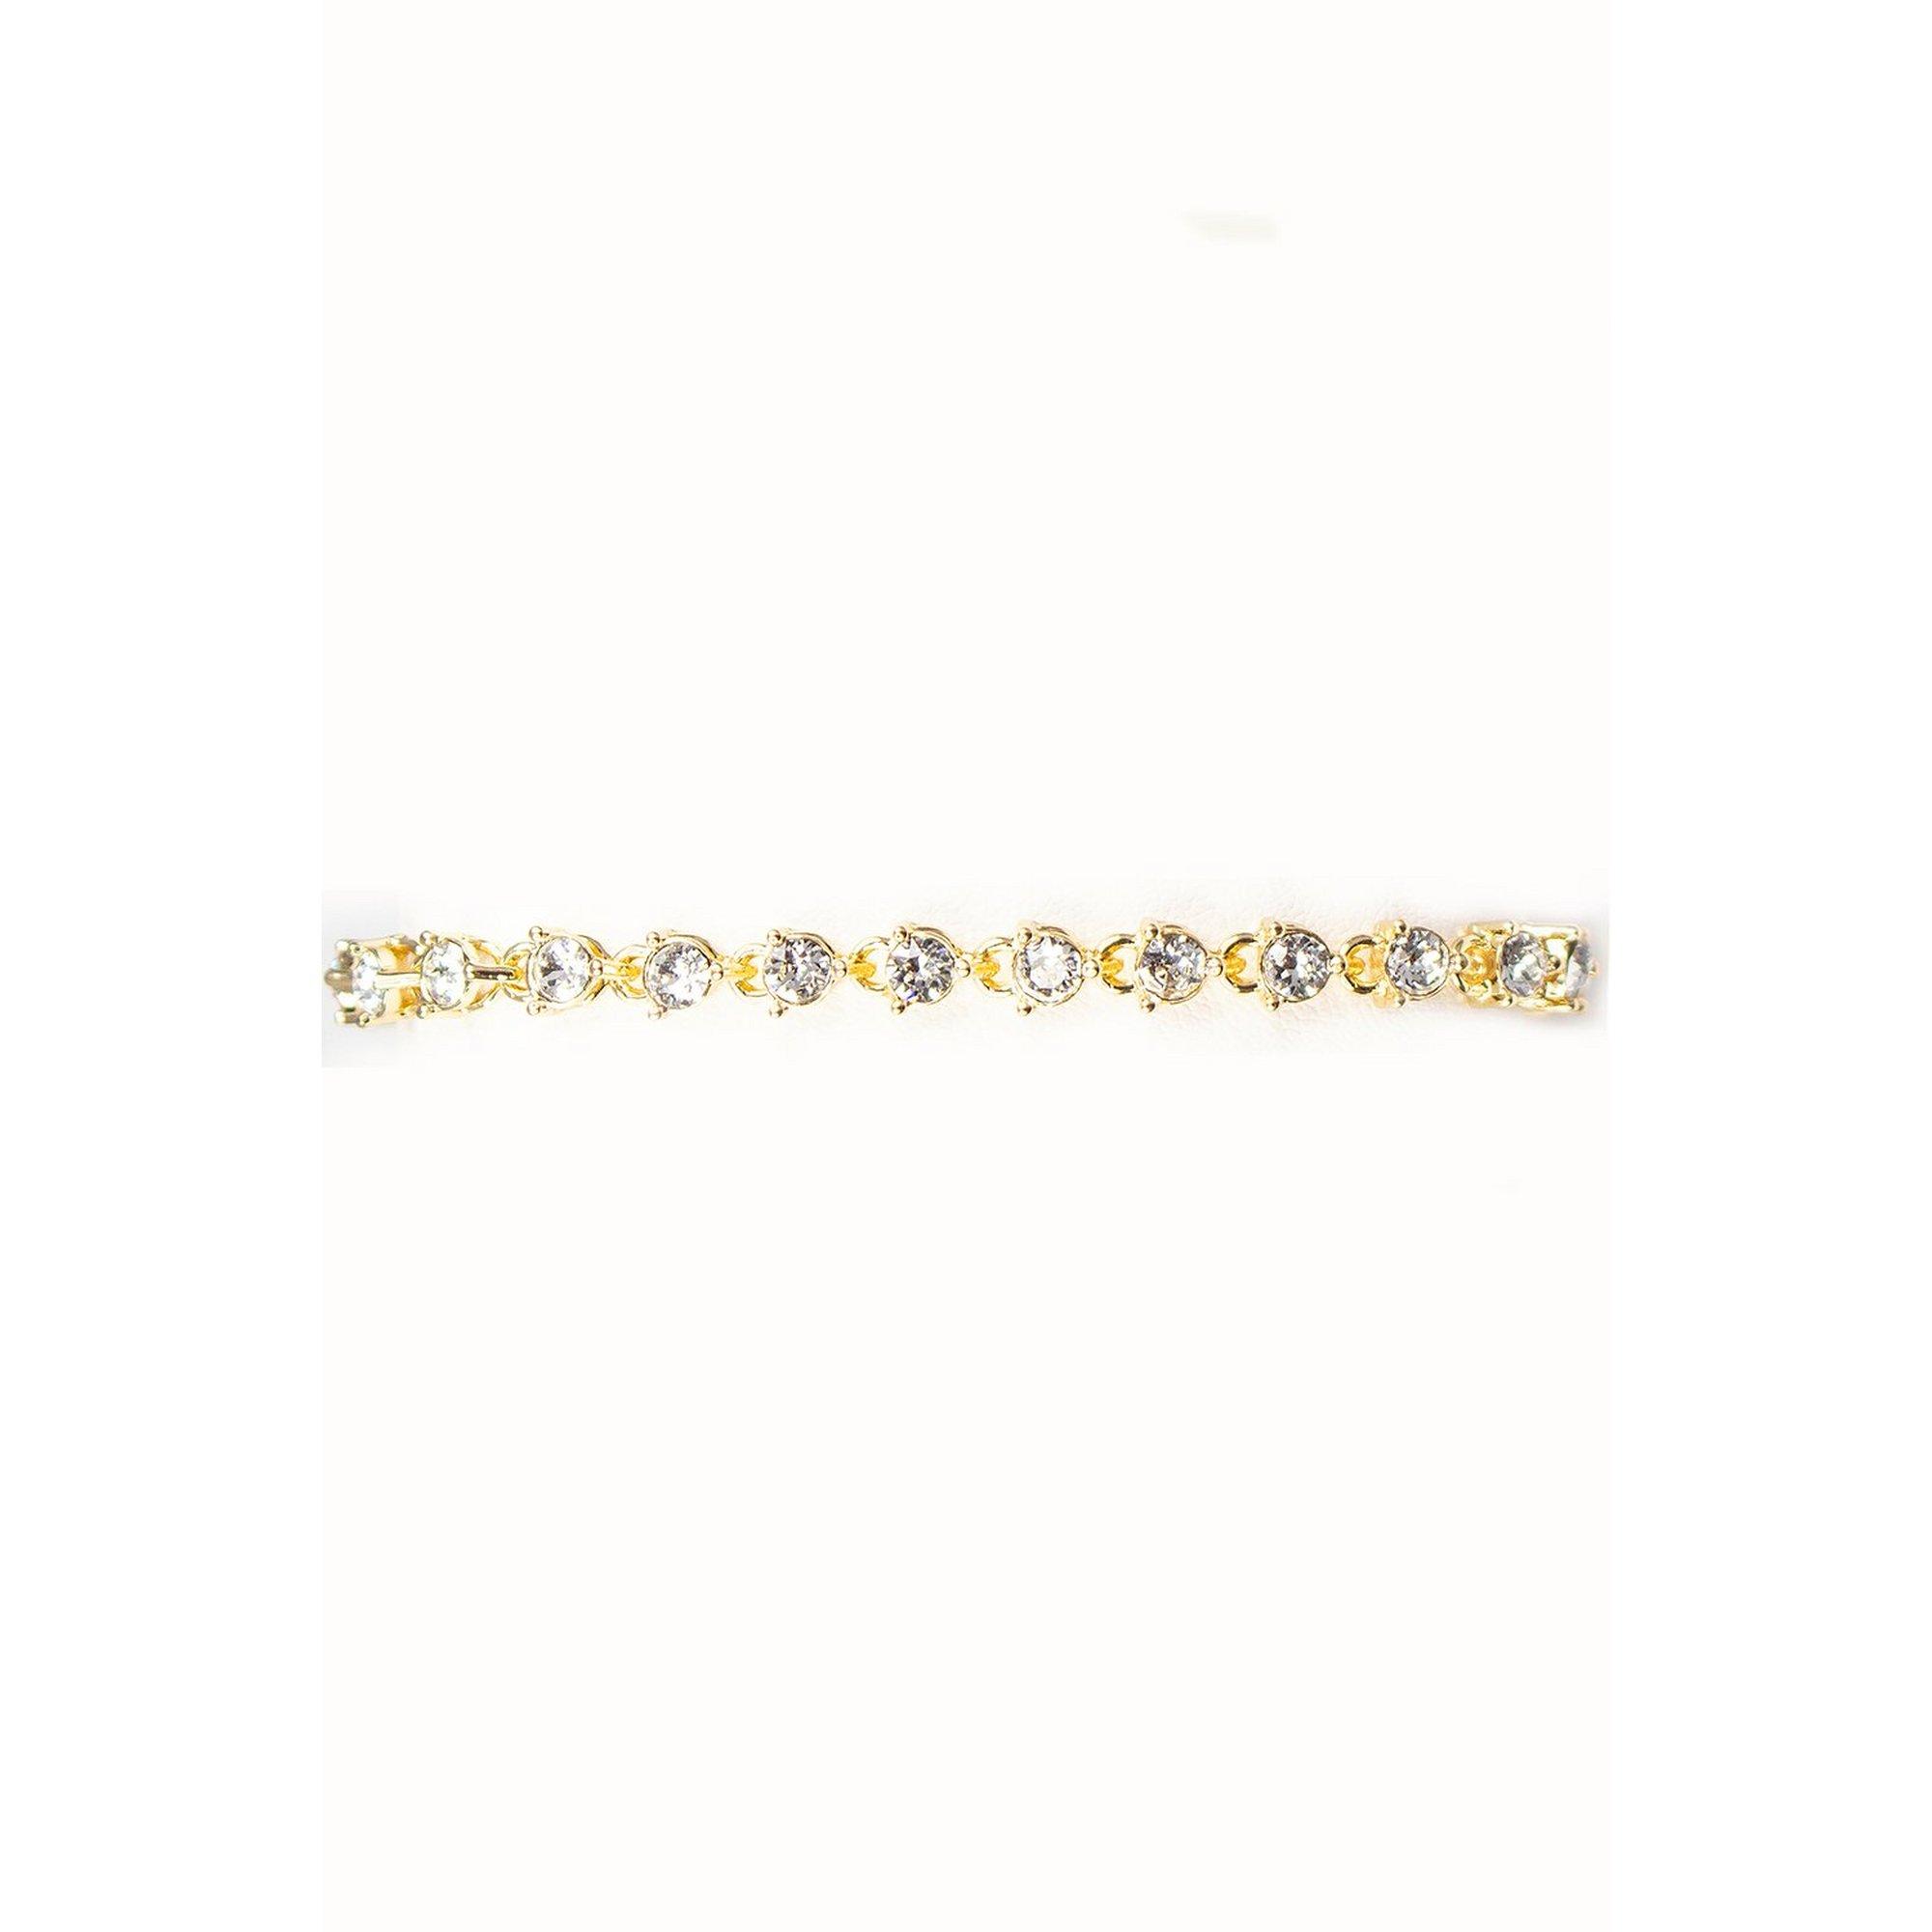 Image of Eternity Gold Bracelet with Swarovski Elements